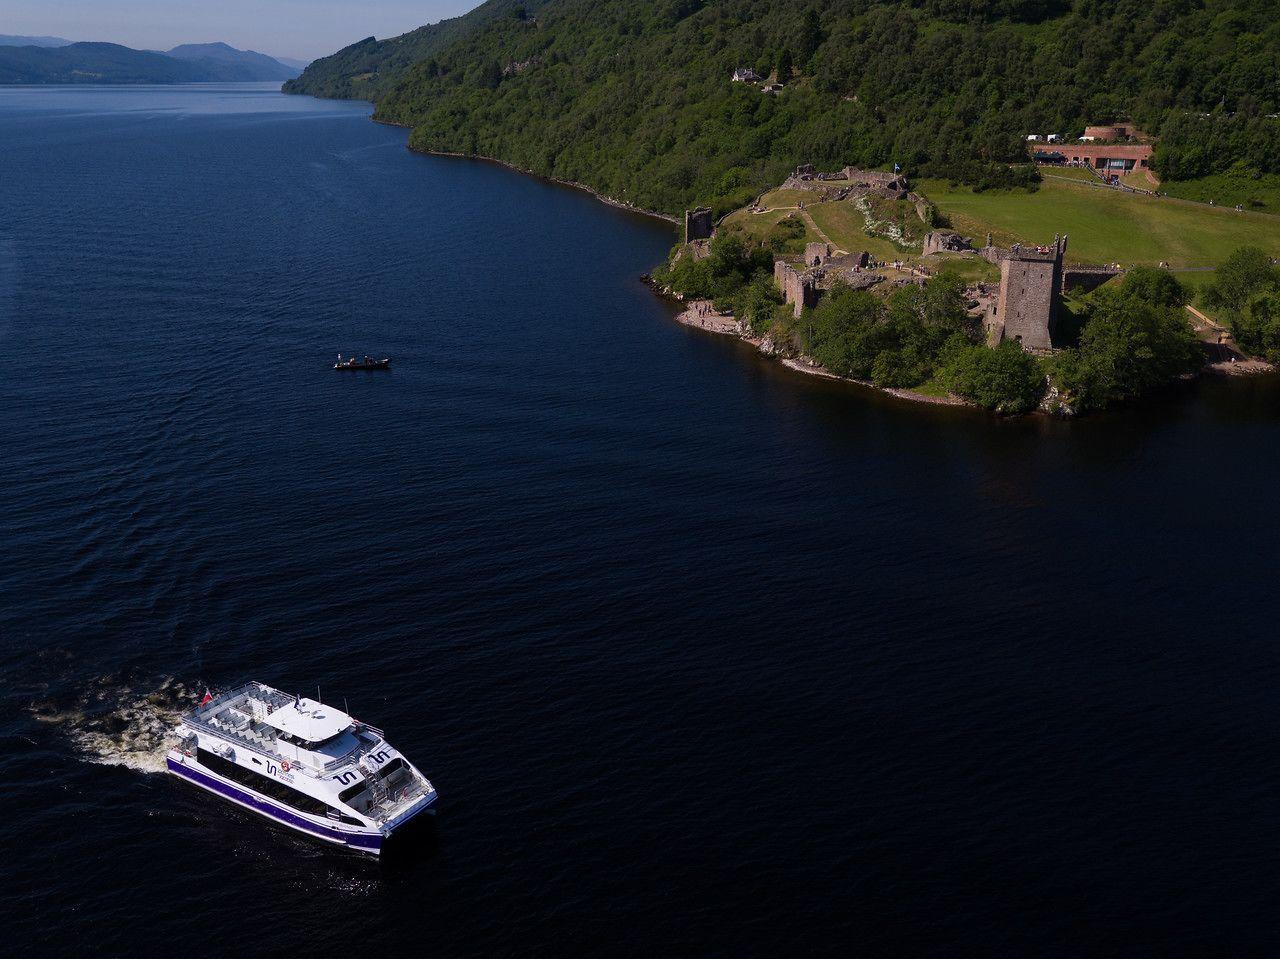 Caledonian Canal & Loch Ness Cruise from Dochgarroch Lock